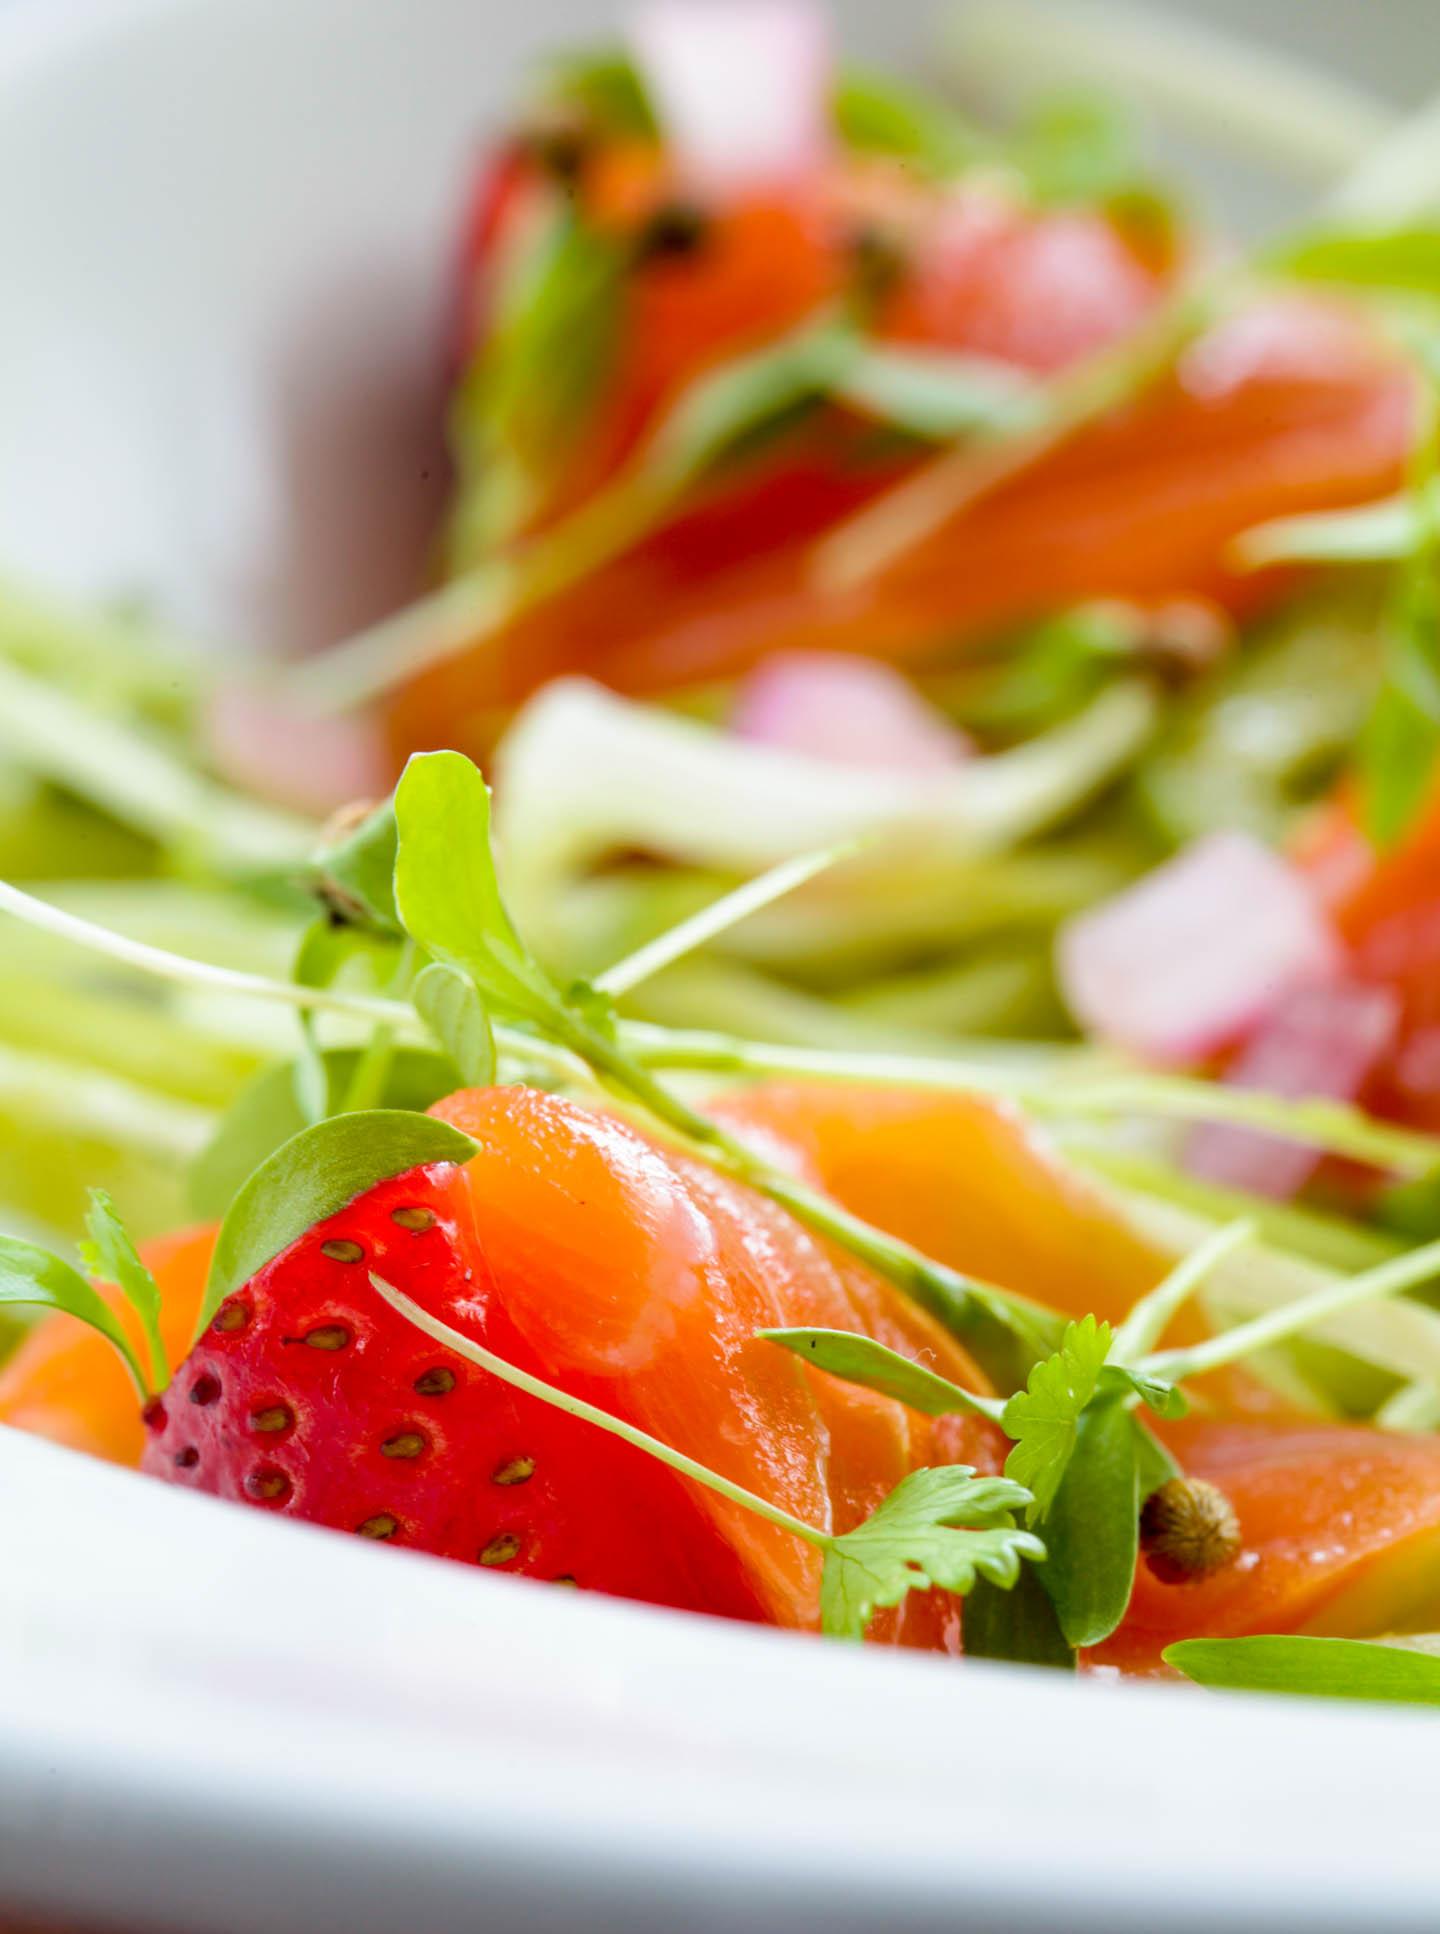 striffler-photography-lifestyle-food-Hamptons-6.jpg